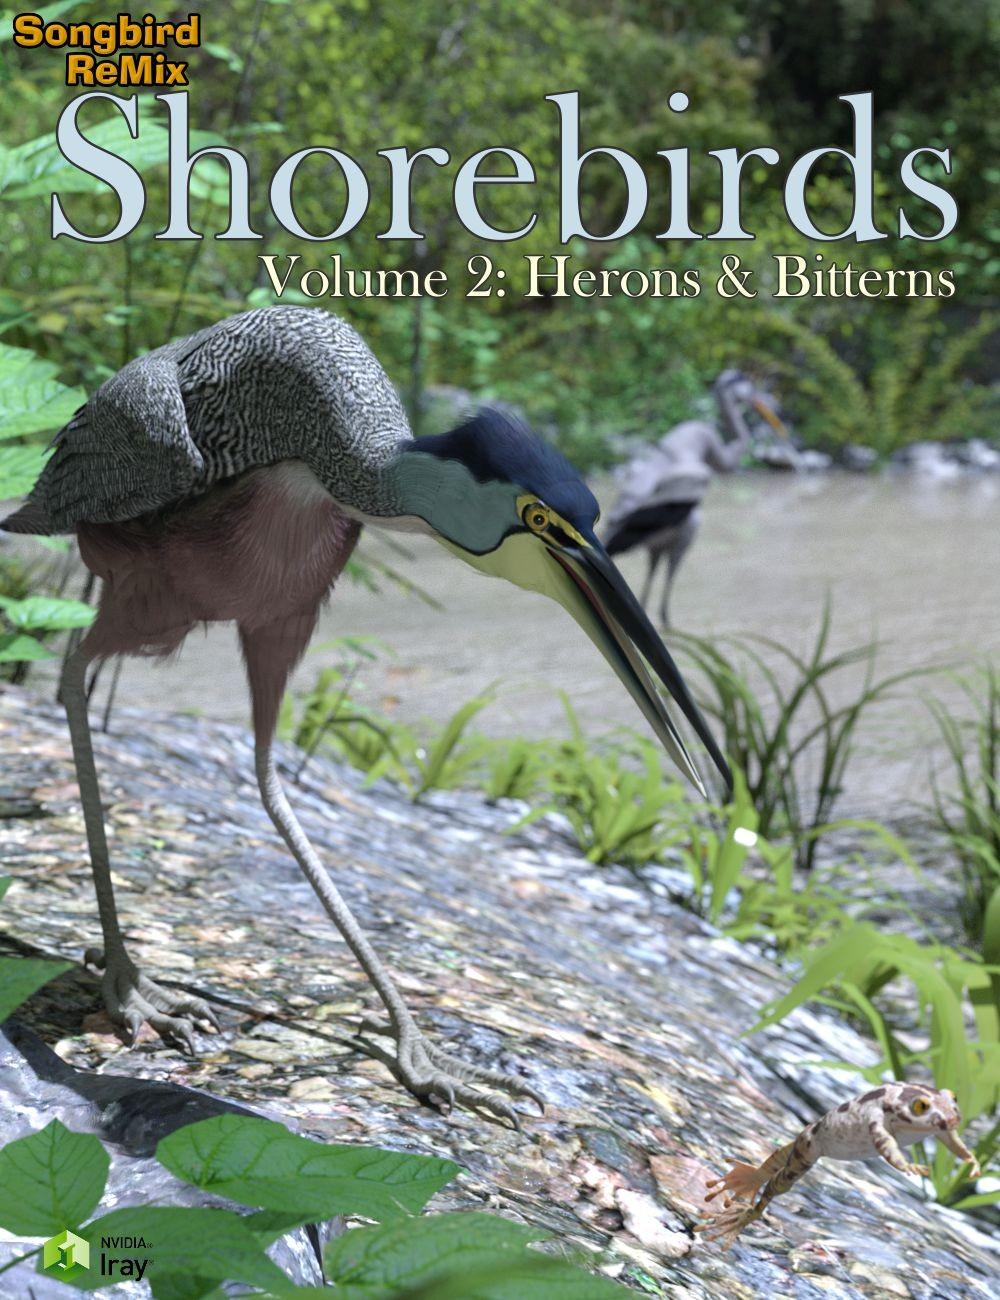 10085-sbrm-shorebirds-vol-2-herons-bitterns-main.jpg